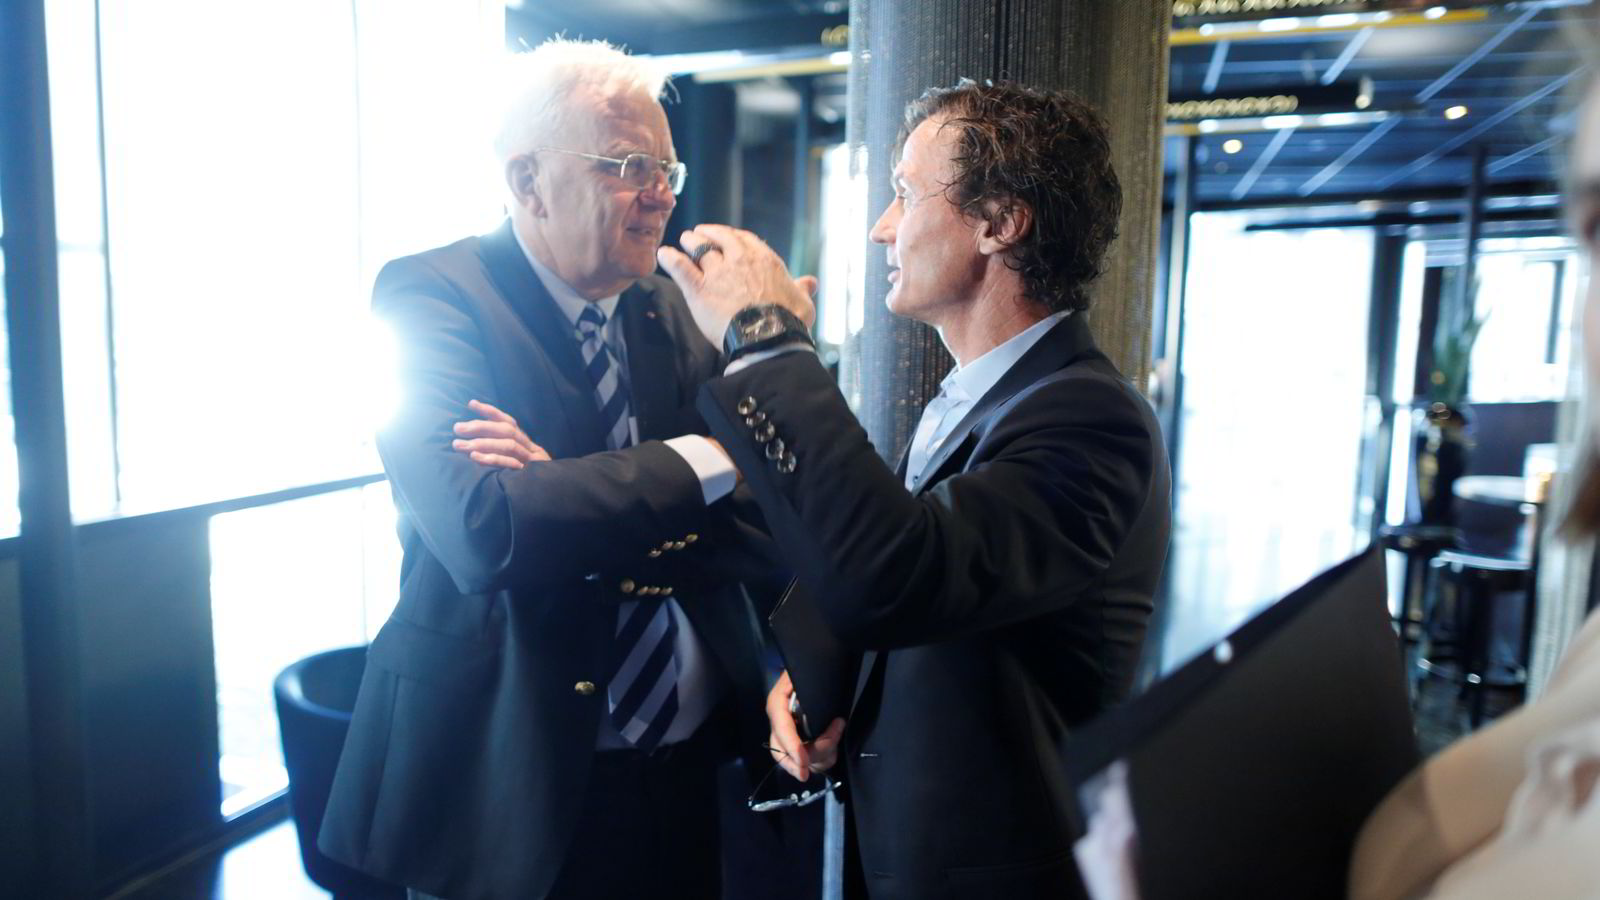 Trygve Hegnar og Petter Stordalen før torsdagens pressekonferanse. Foto: